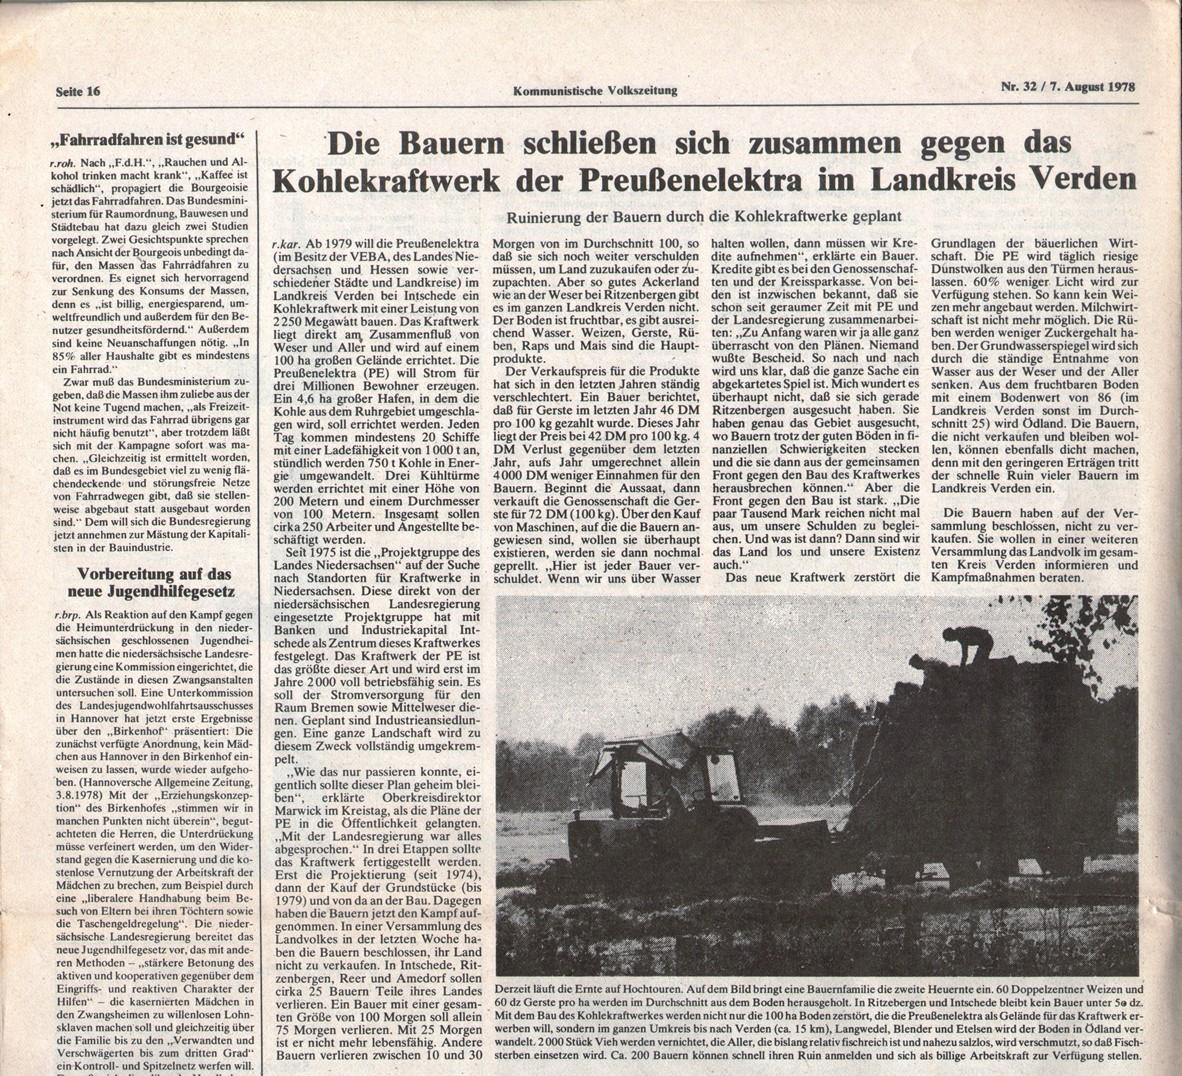 Hamburg_KVZ_1978_32_31